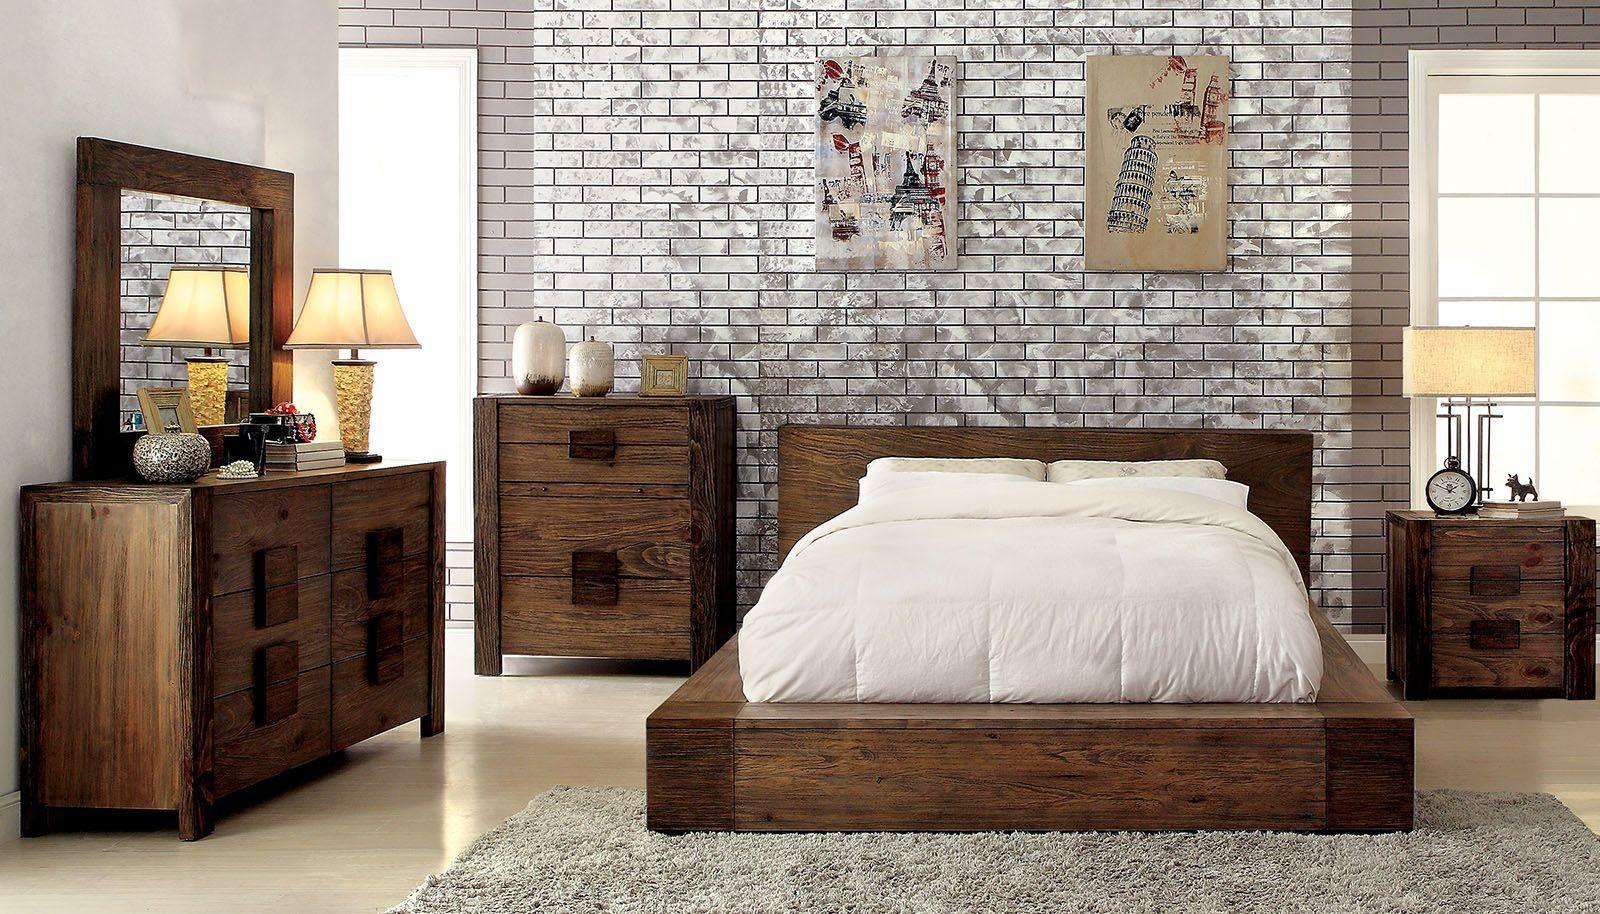 Janeiro Rustic Natural Bedroom Set CM7628Q Furniture of America